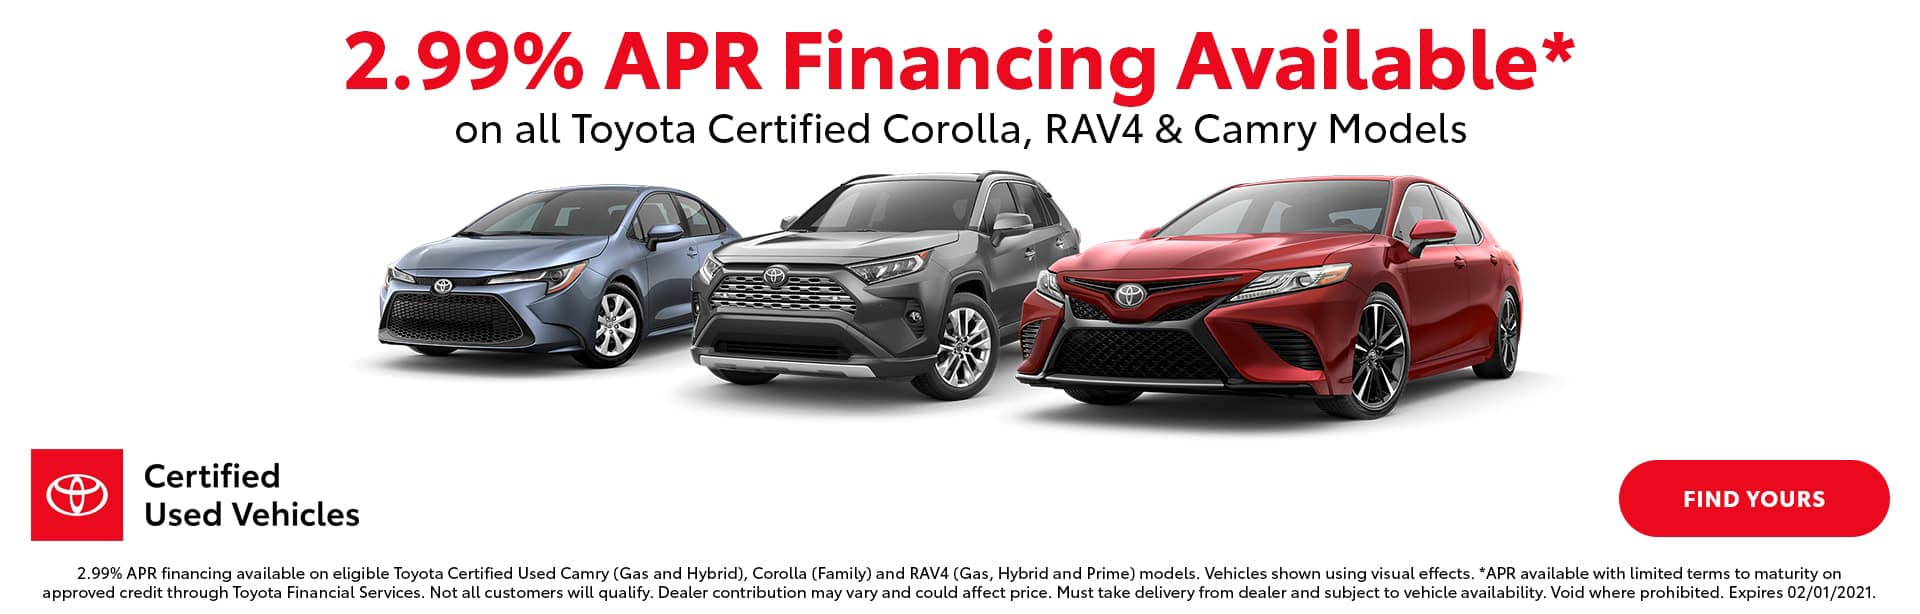 Toyota, Camry, RAV4, Corolla, TCUV